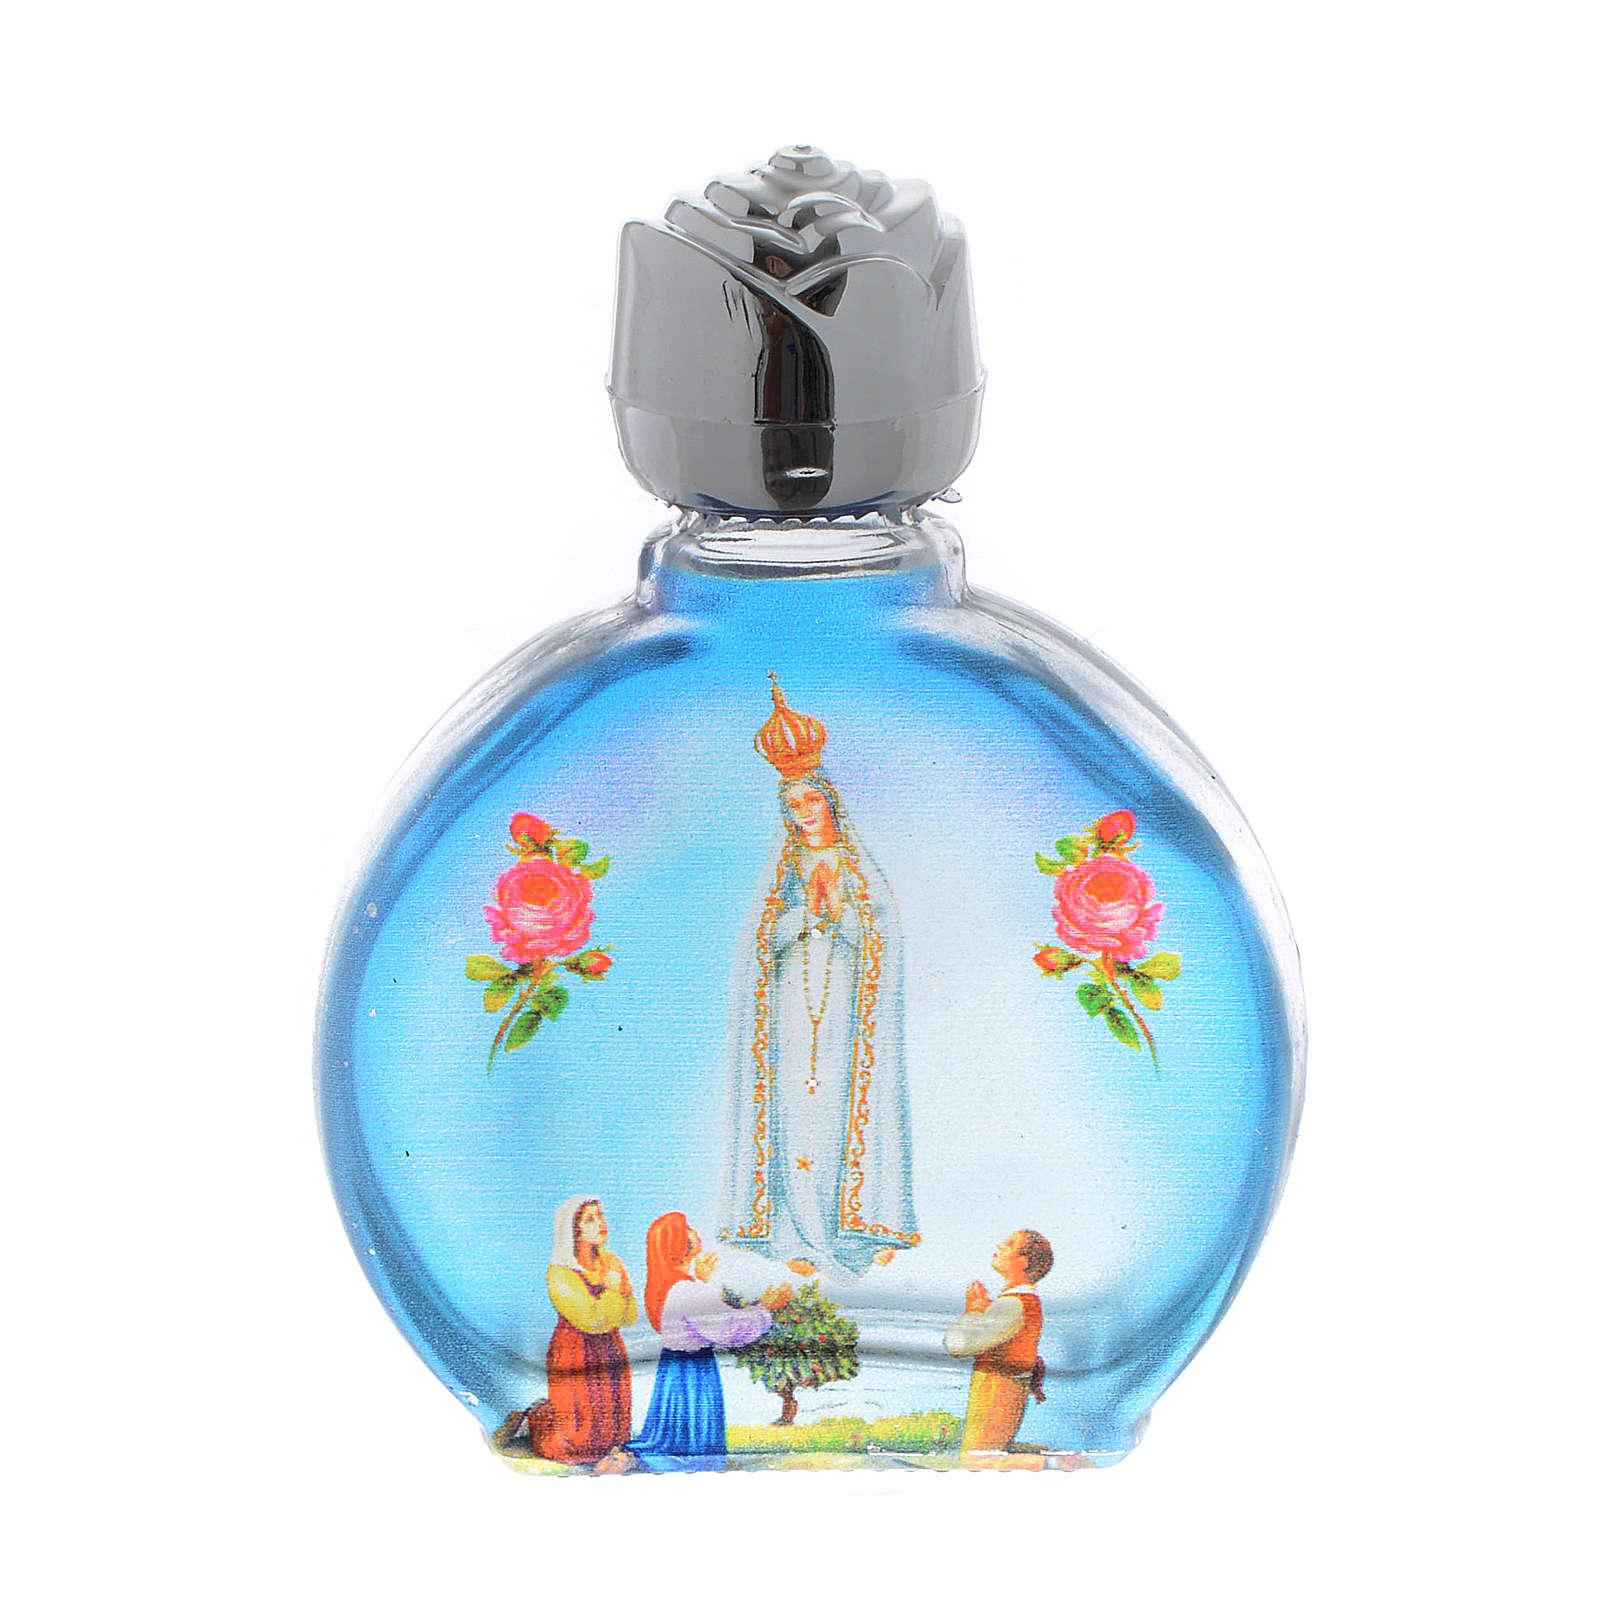 Garrafinha água benta vidro Nossa Senhora Fátima 3